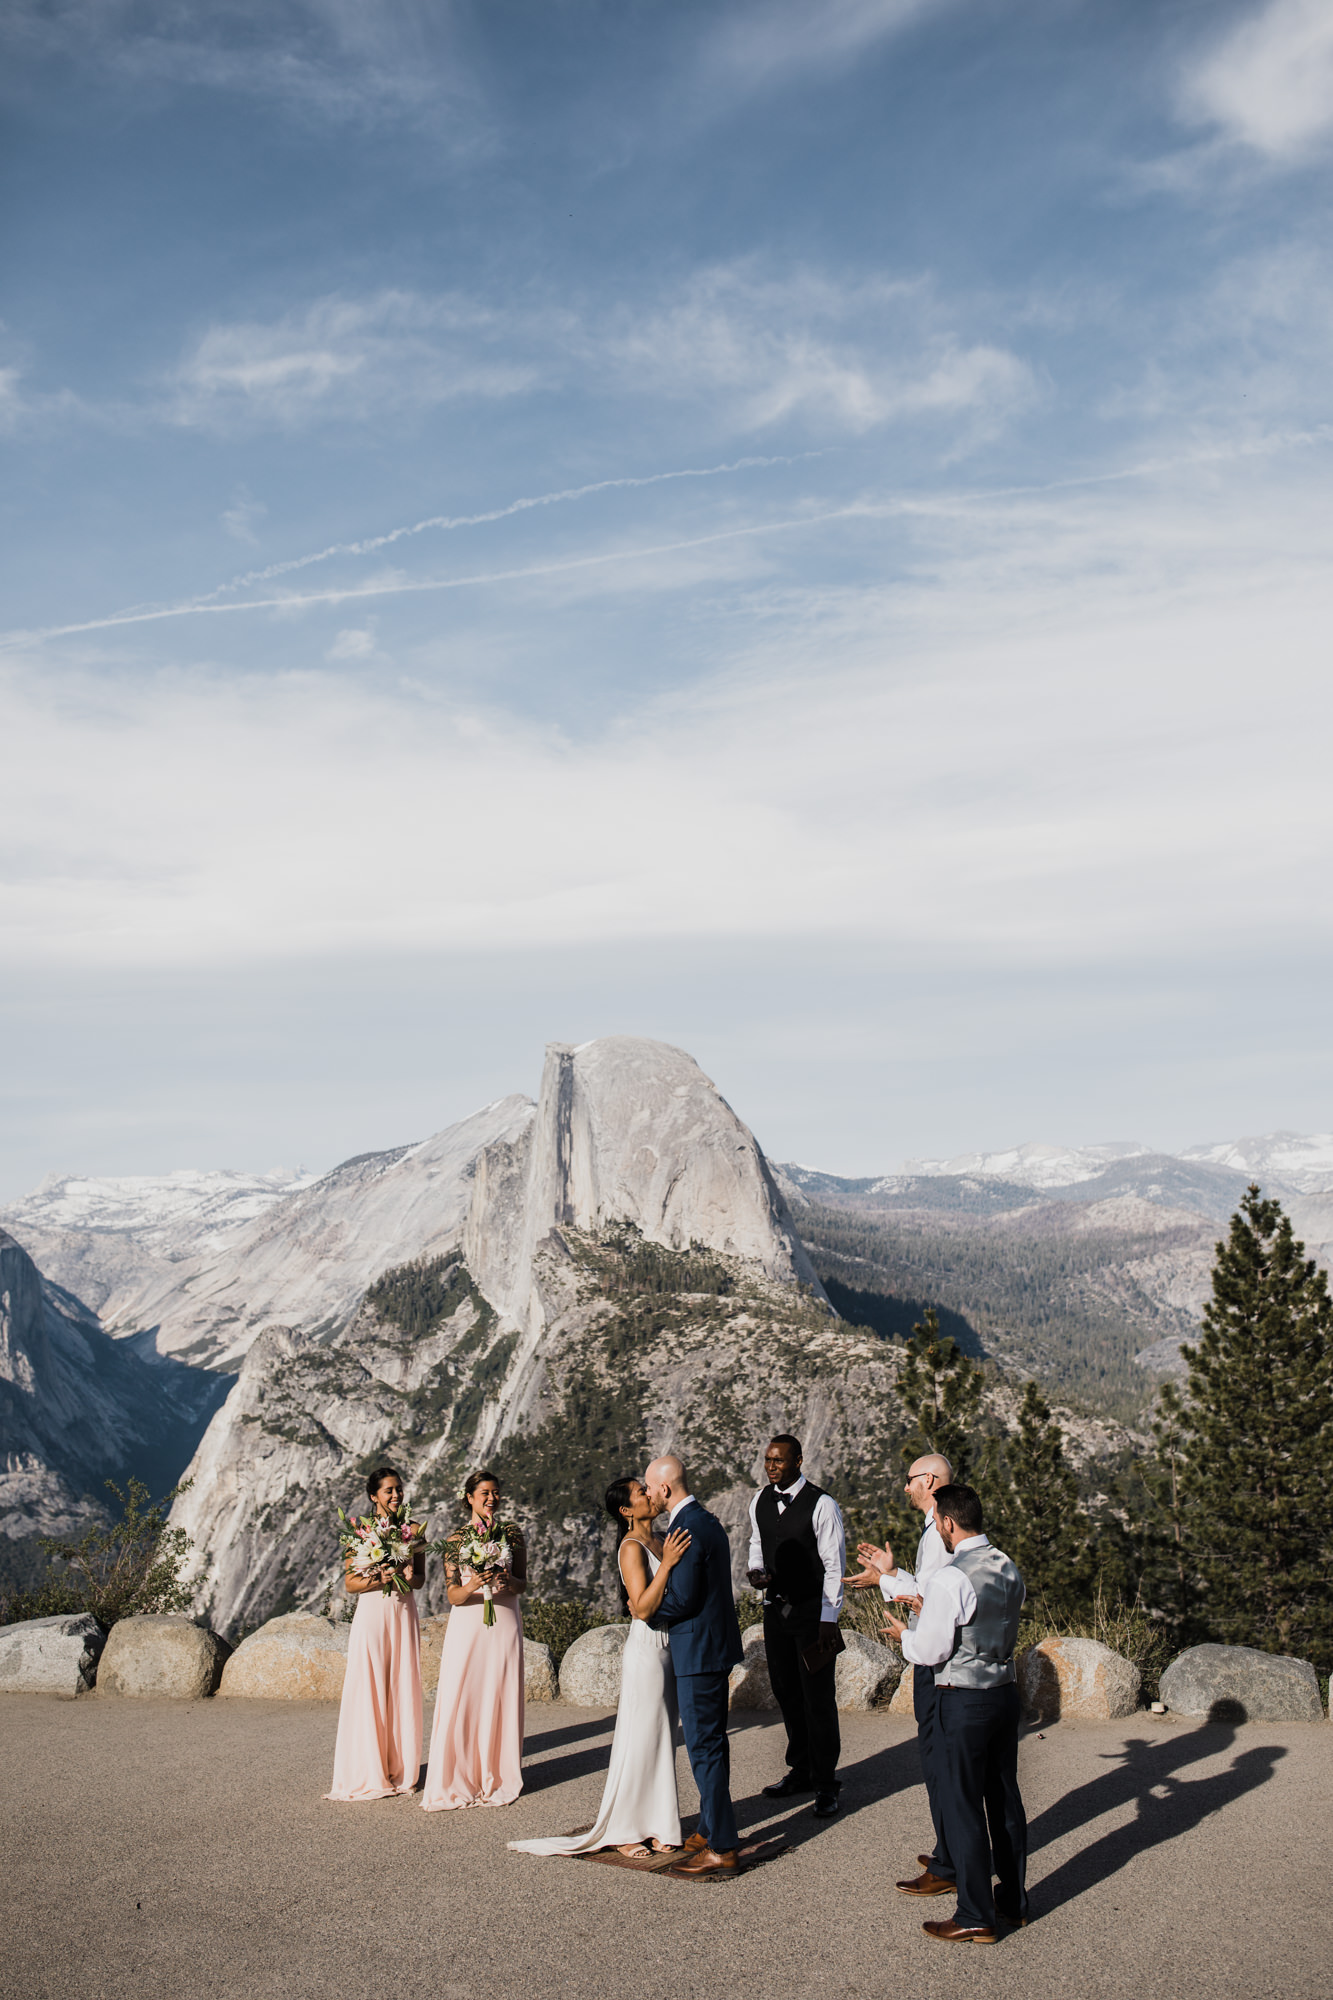 glacier point wedding ceremony in yosemite national park | destination adventure wedding photographers | the hearnes adventure photography | www.thehearnes.com